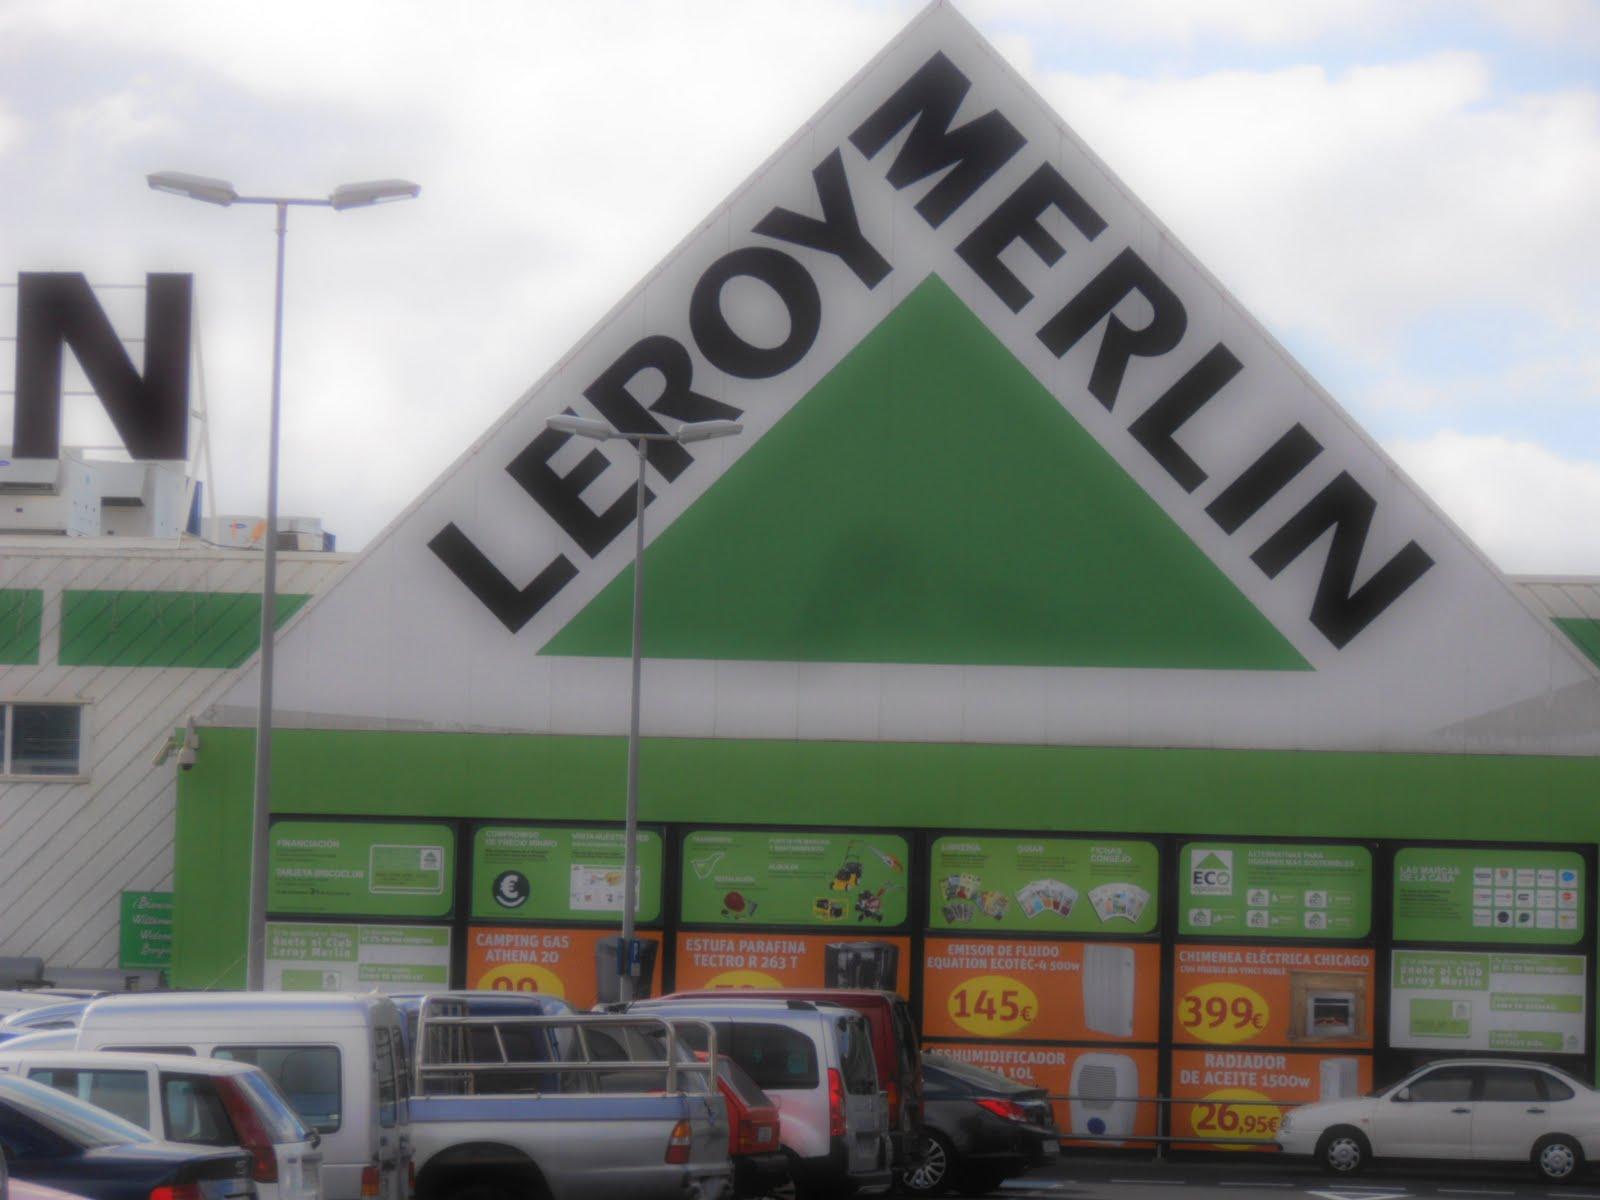 Club adacates adacates en leroy merlin for Club leroy merlin